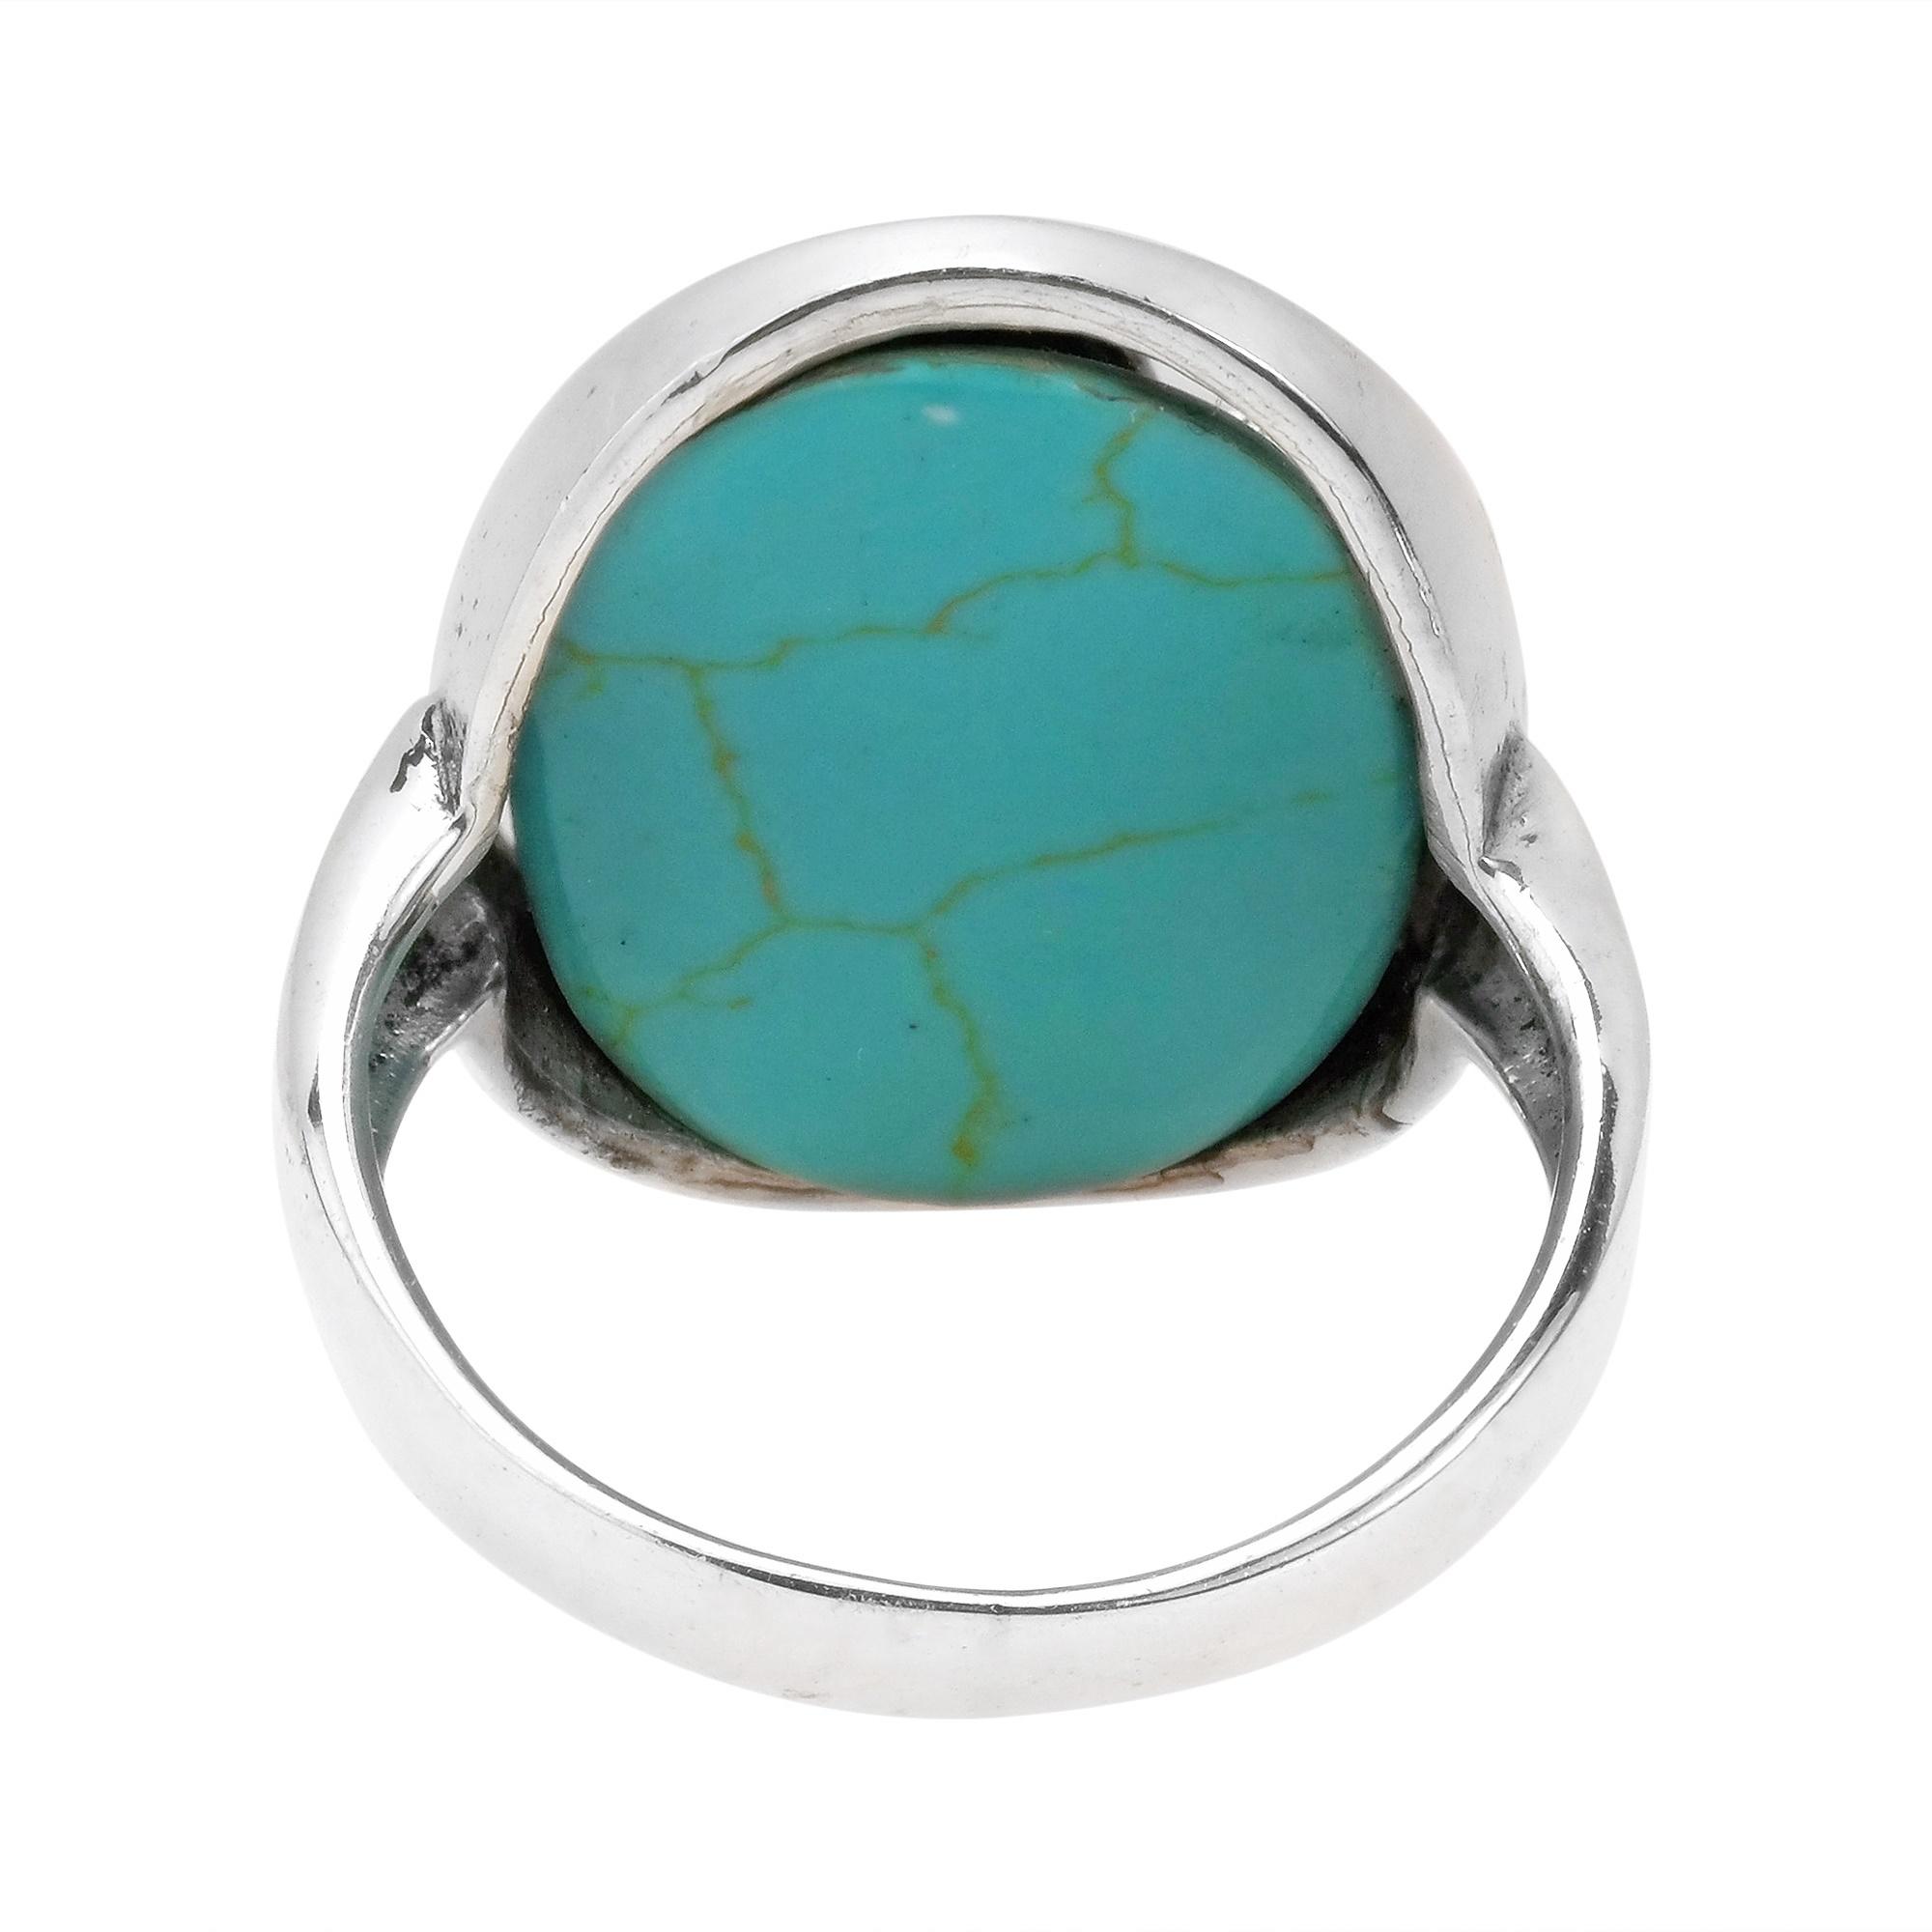 aum om prayer symbol green turquoise 925 silver ring 6